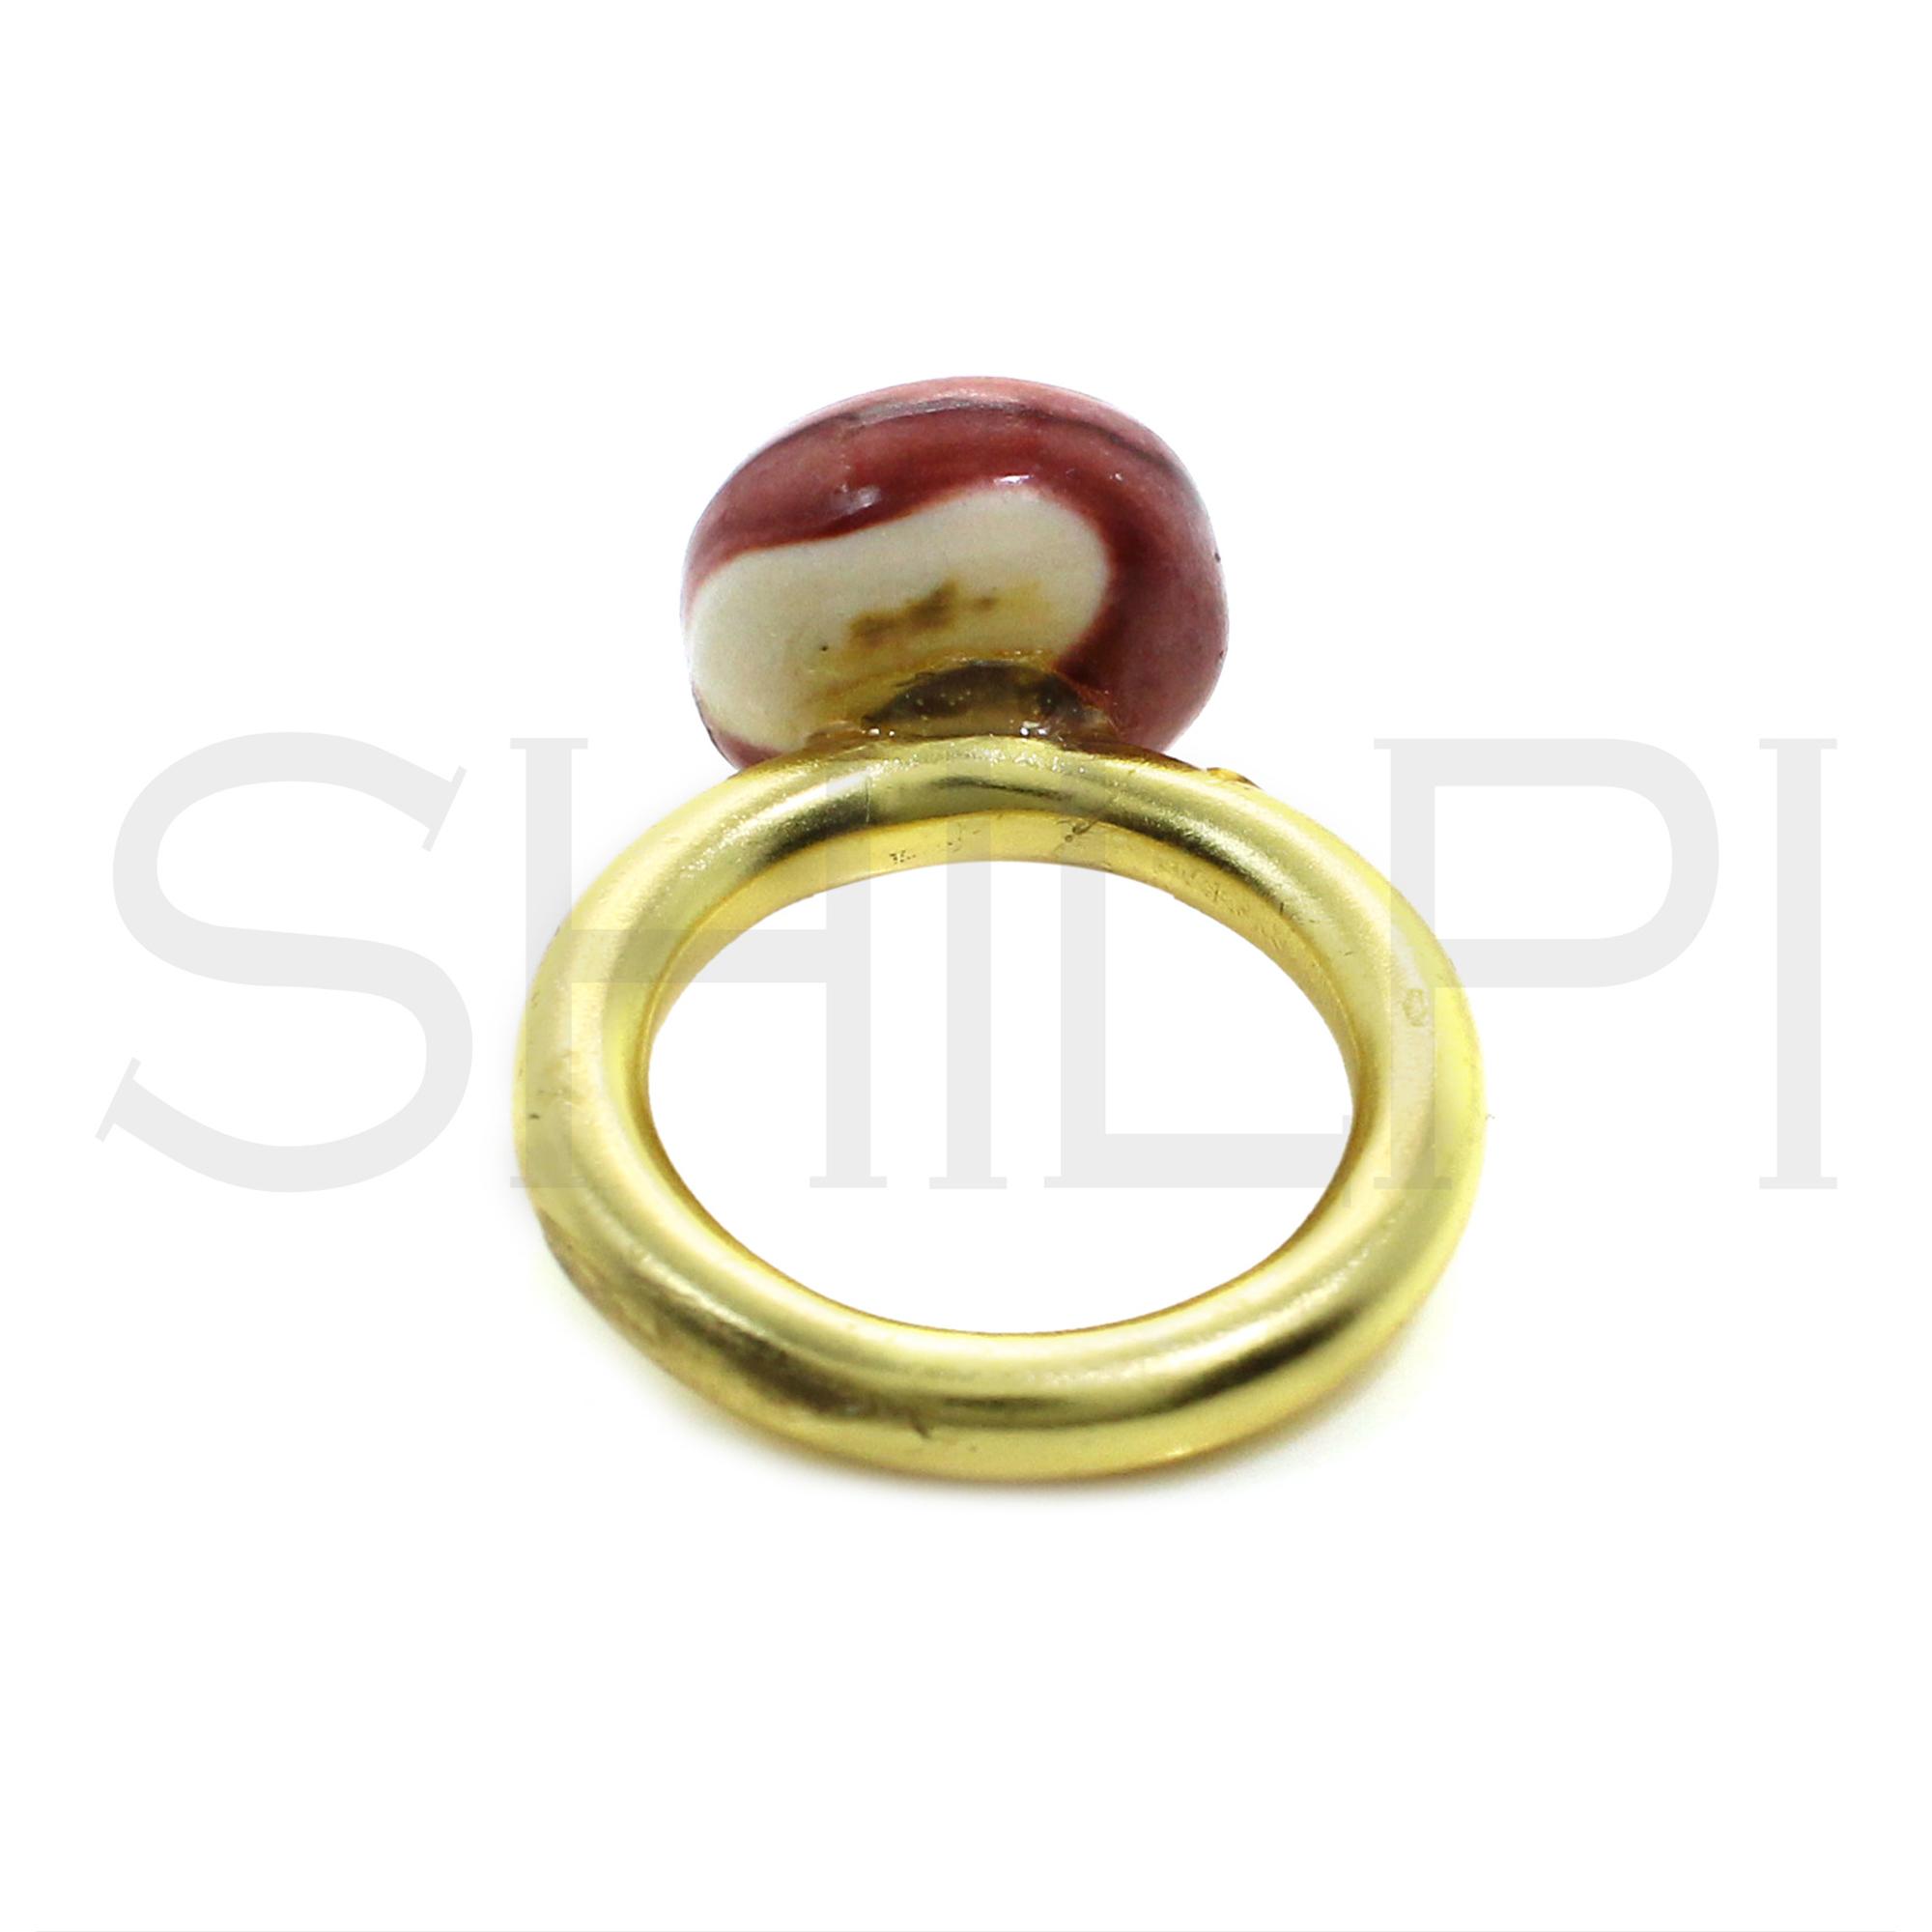 Handmade Gold Plated Ring With Mookaite Jasper